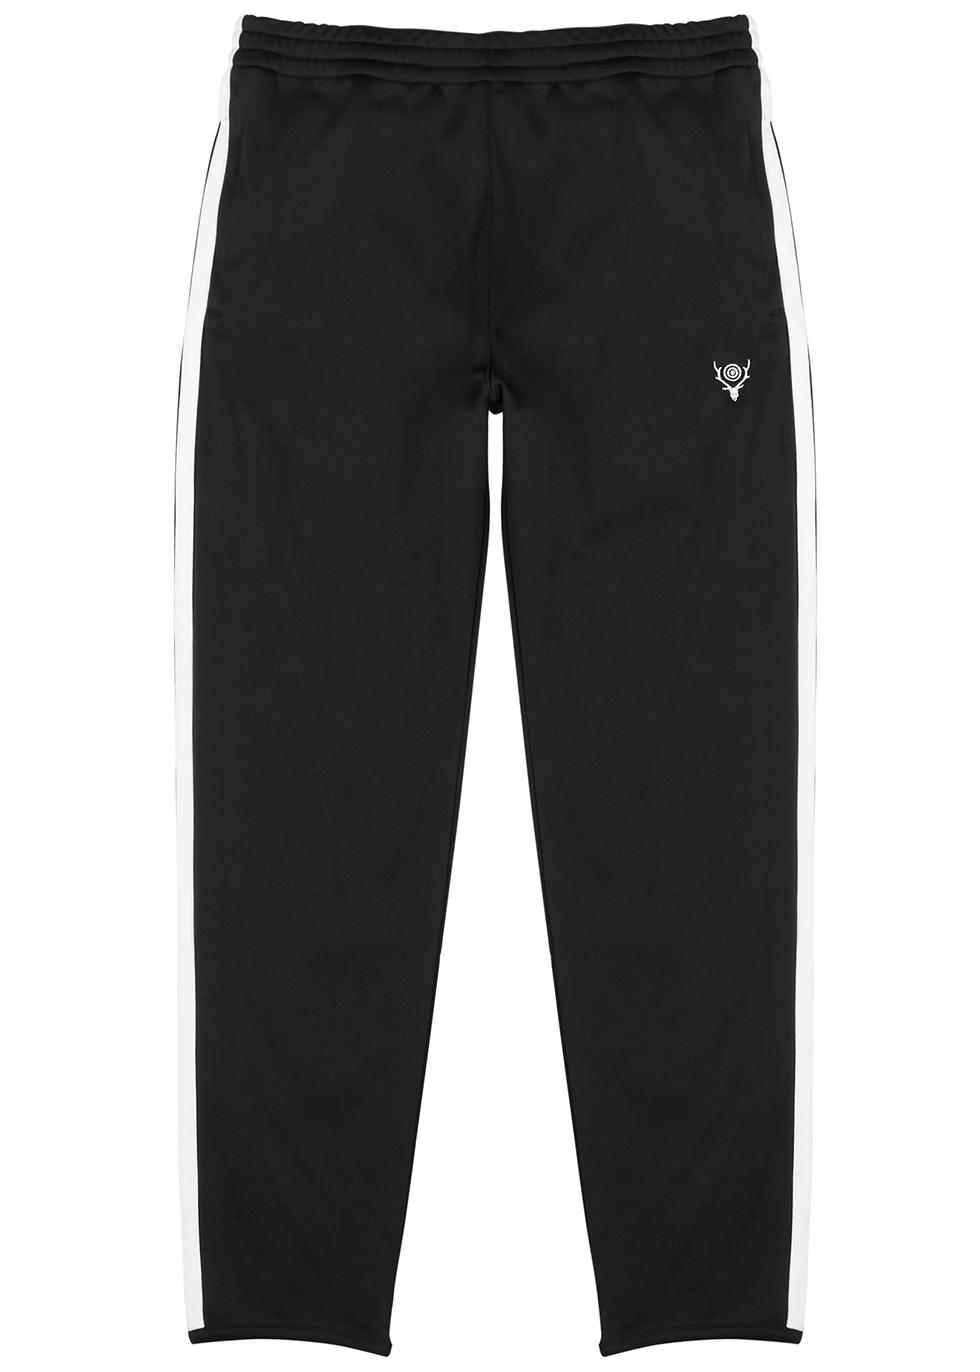 Trainer black jersey sweatpants - South2 West8